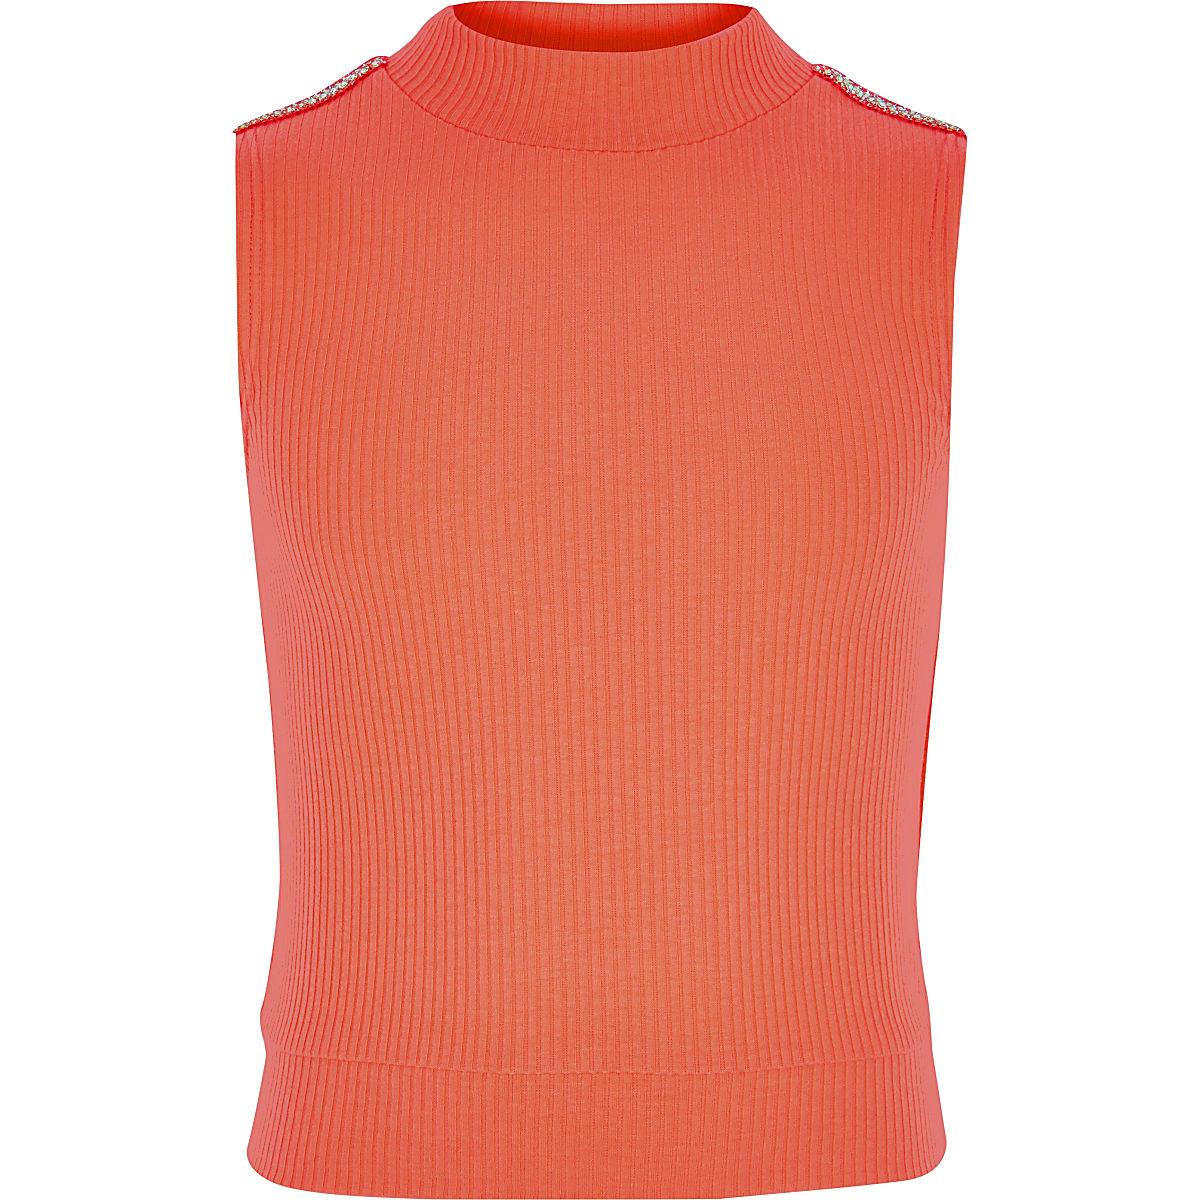 Girls neon orange diamante trim high neck top